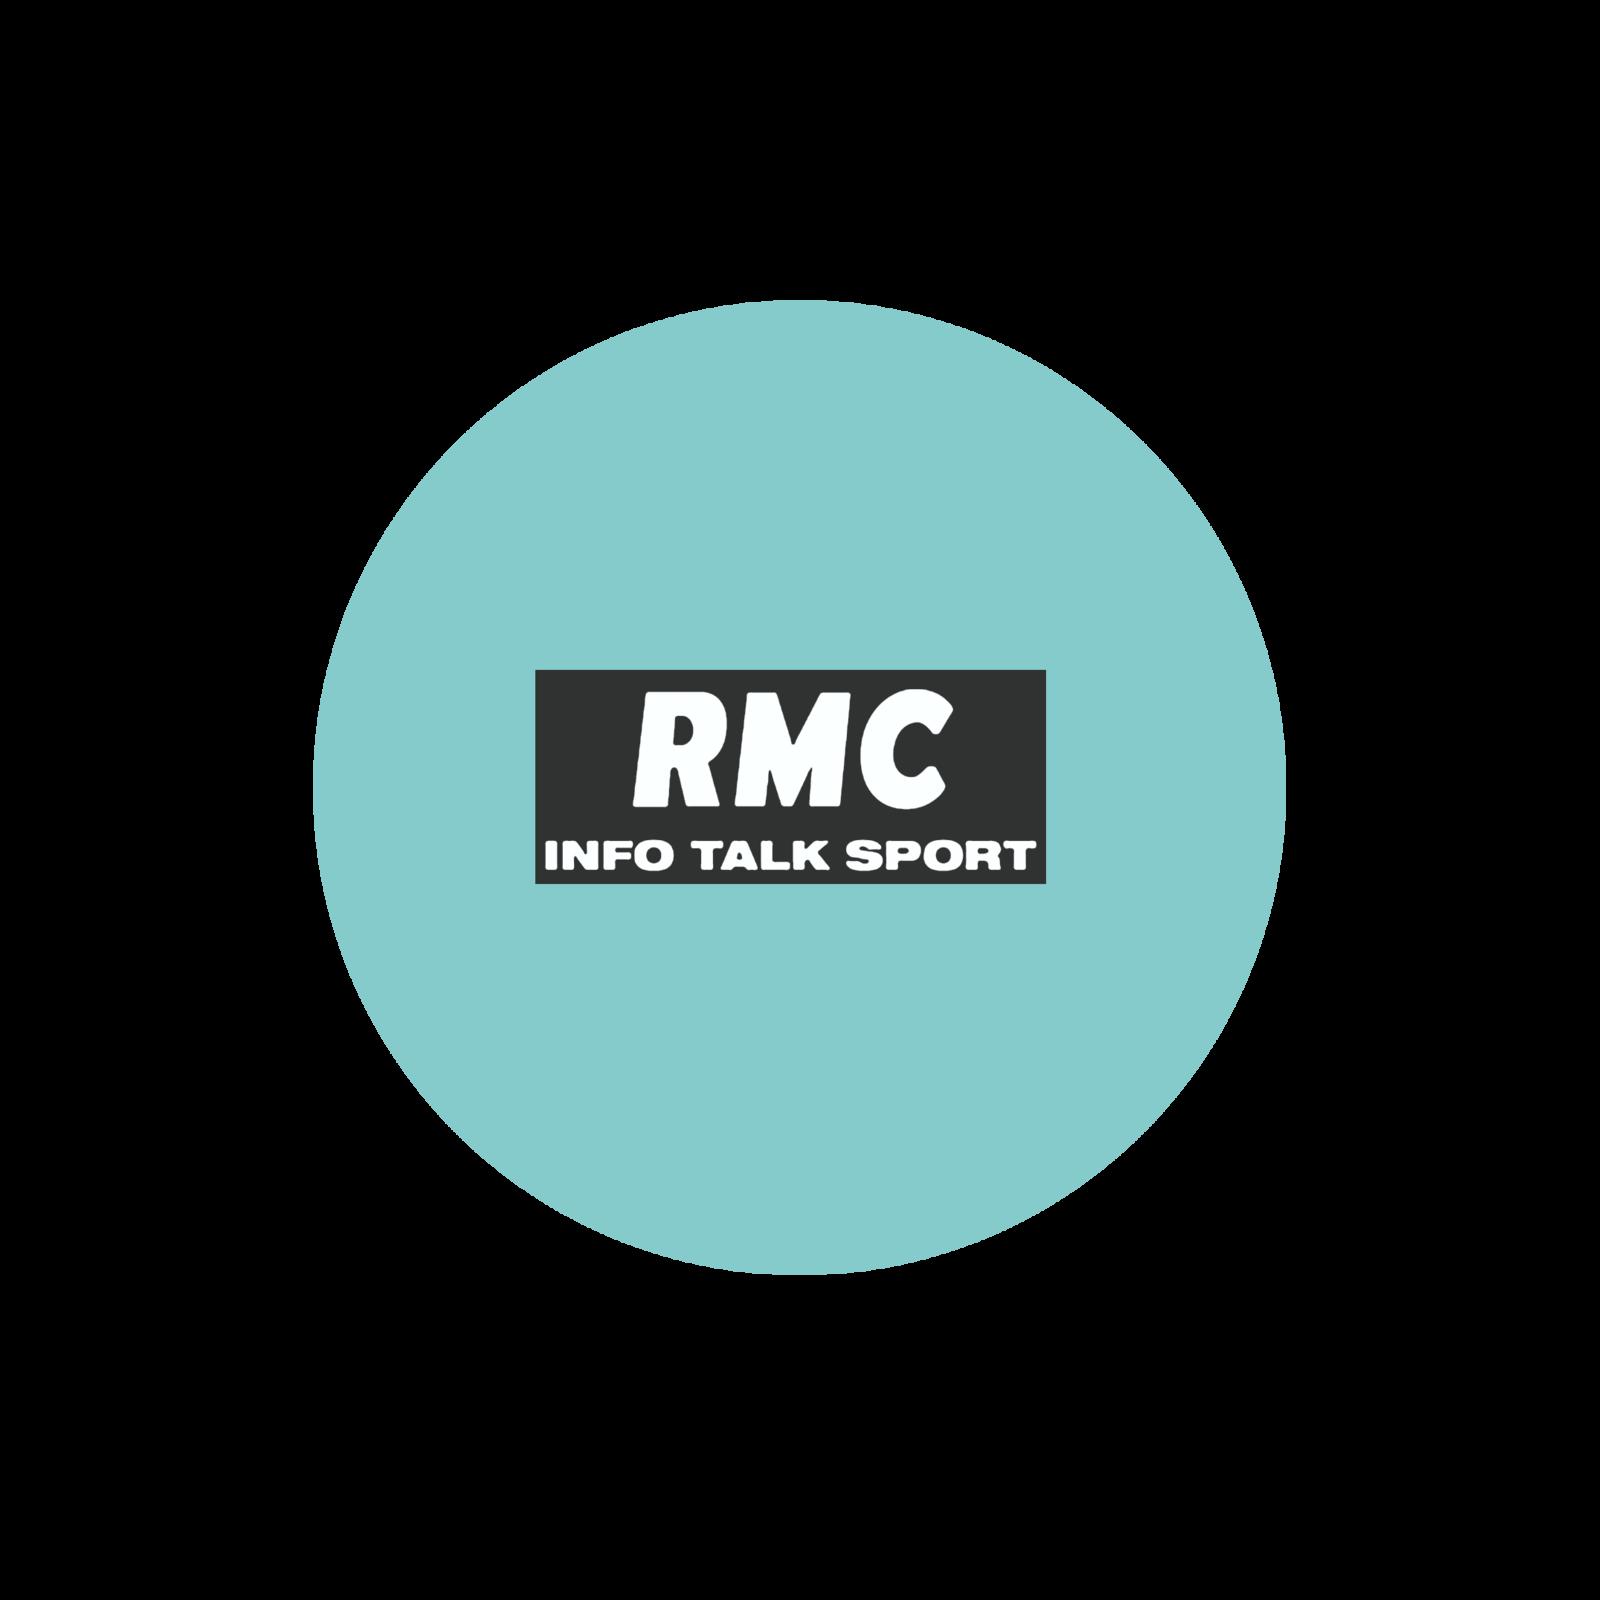 Première du talk de Maïtena Biraben ce lundi sur RMC.